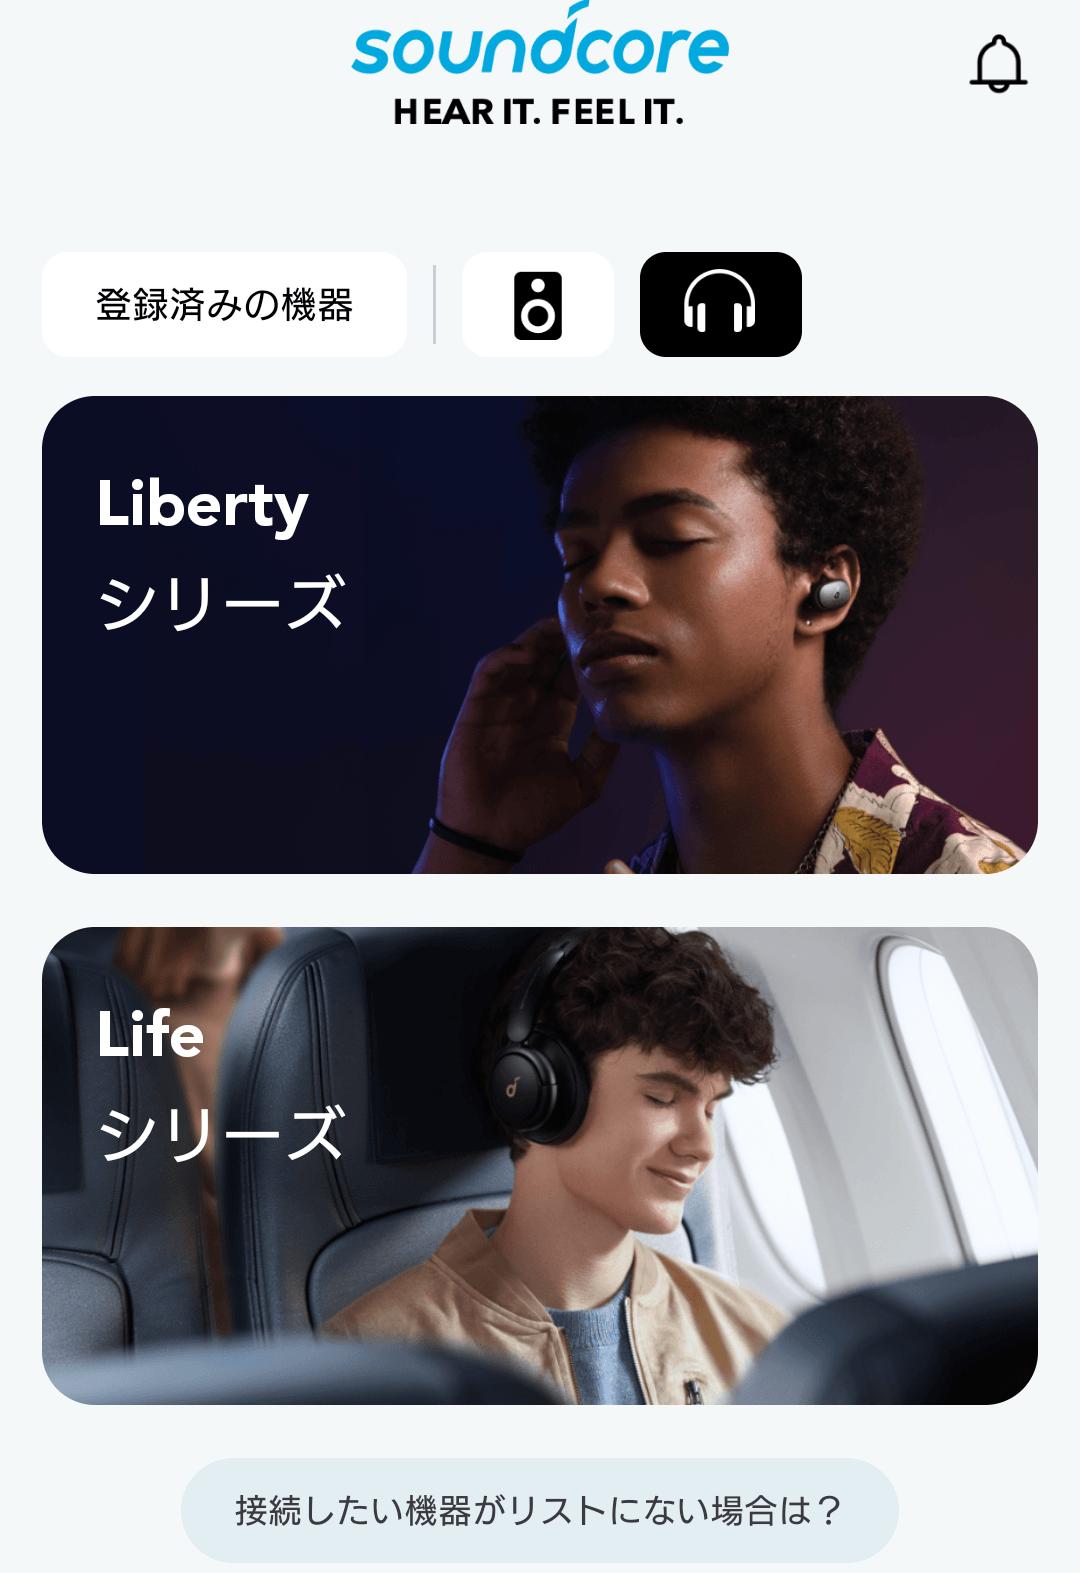 Screenshot 20210513 221453 - 【Anker】Soundcore Liberty Air 2 Proをレビュー!~コスパ抜群の機能性を搭載した完全ワイヤレスイヤホン!~